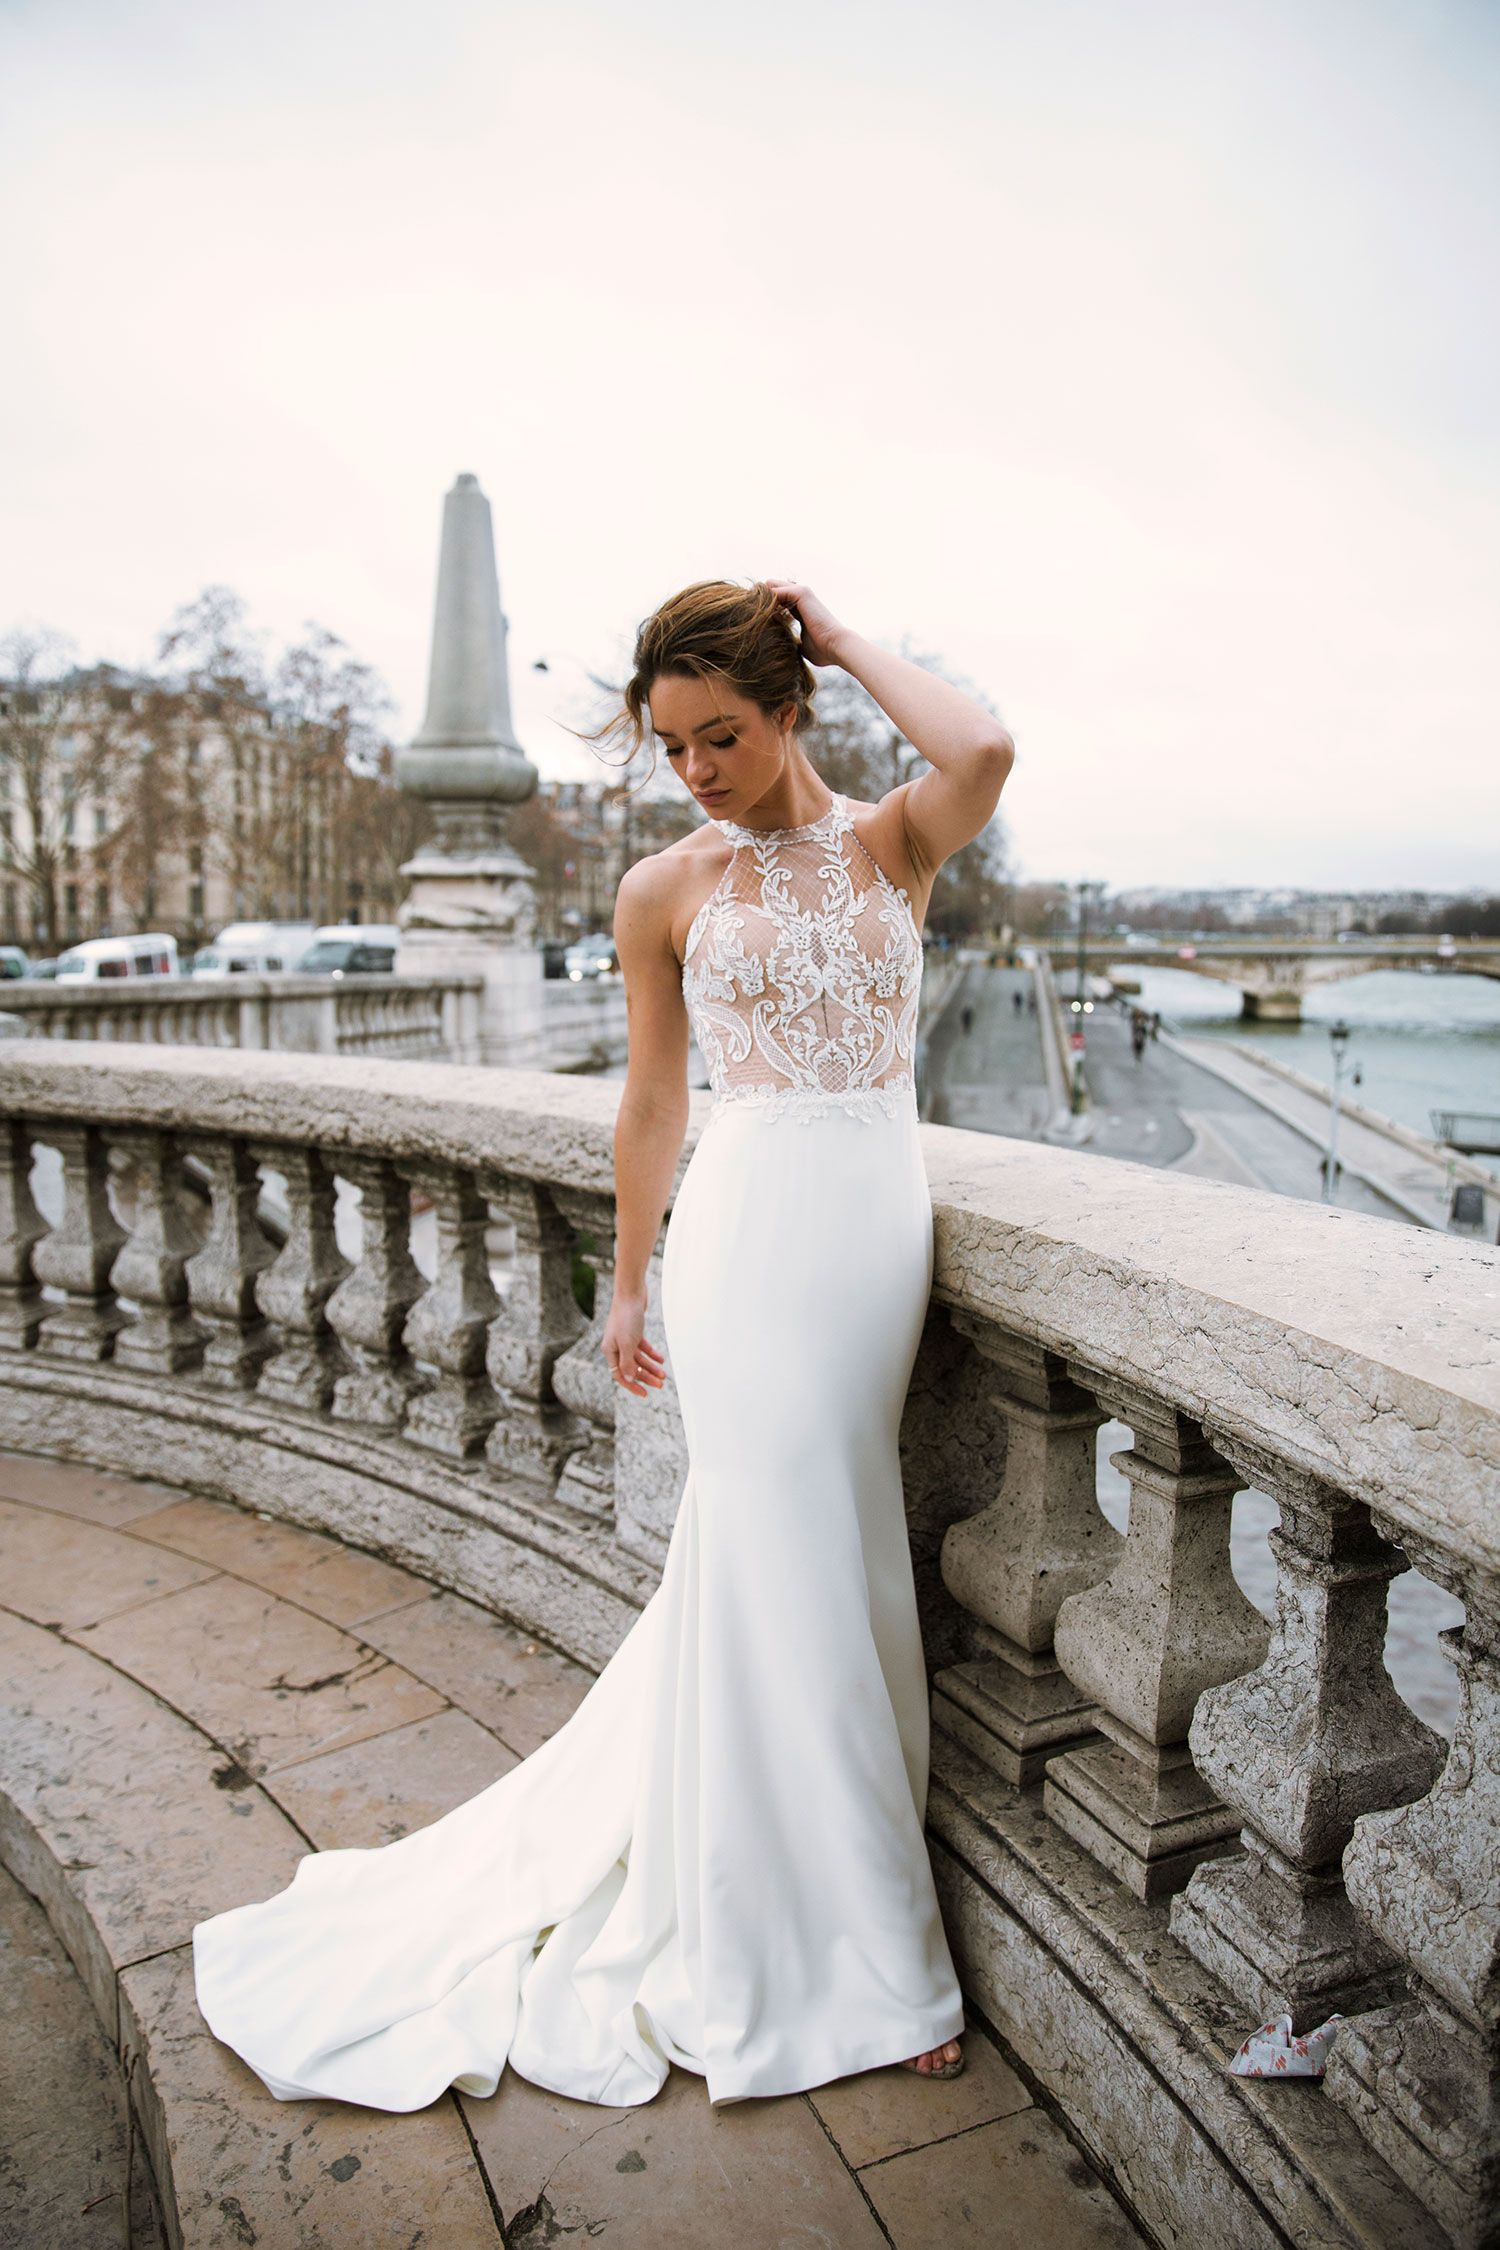 Fable Australian wedding dresses, Fit n flare wedding